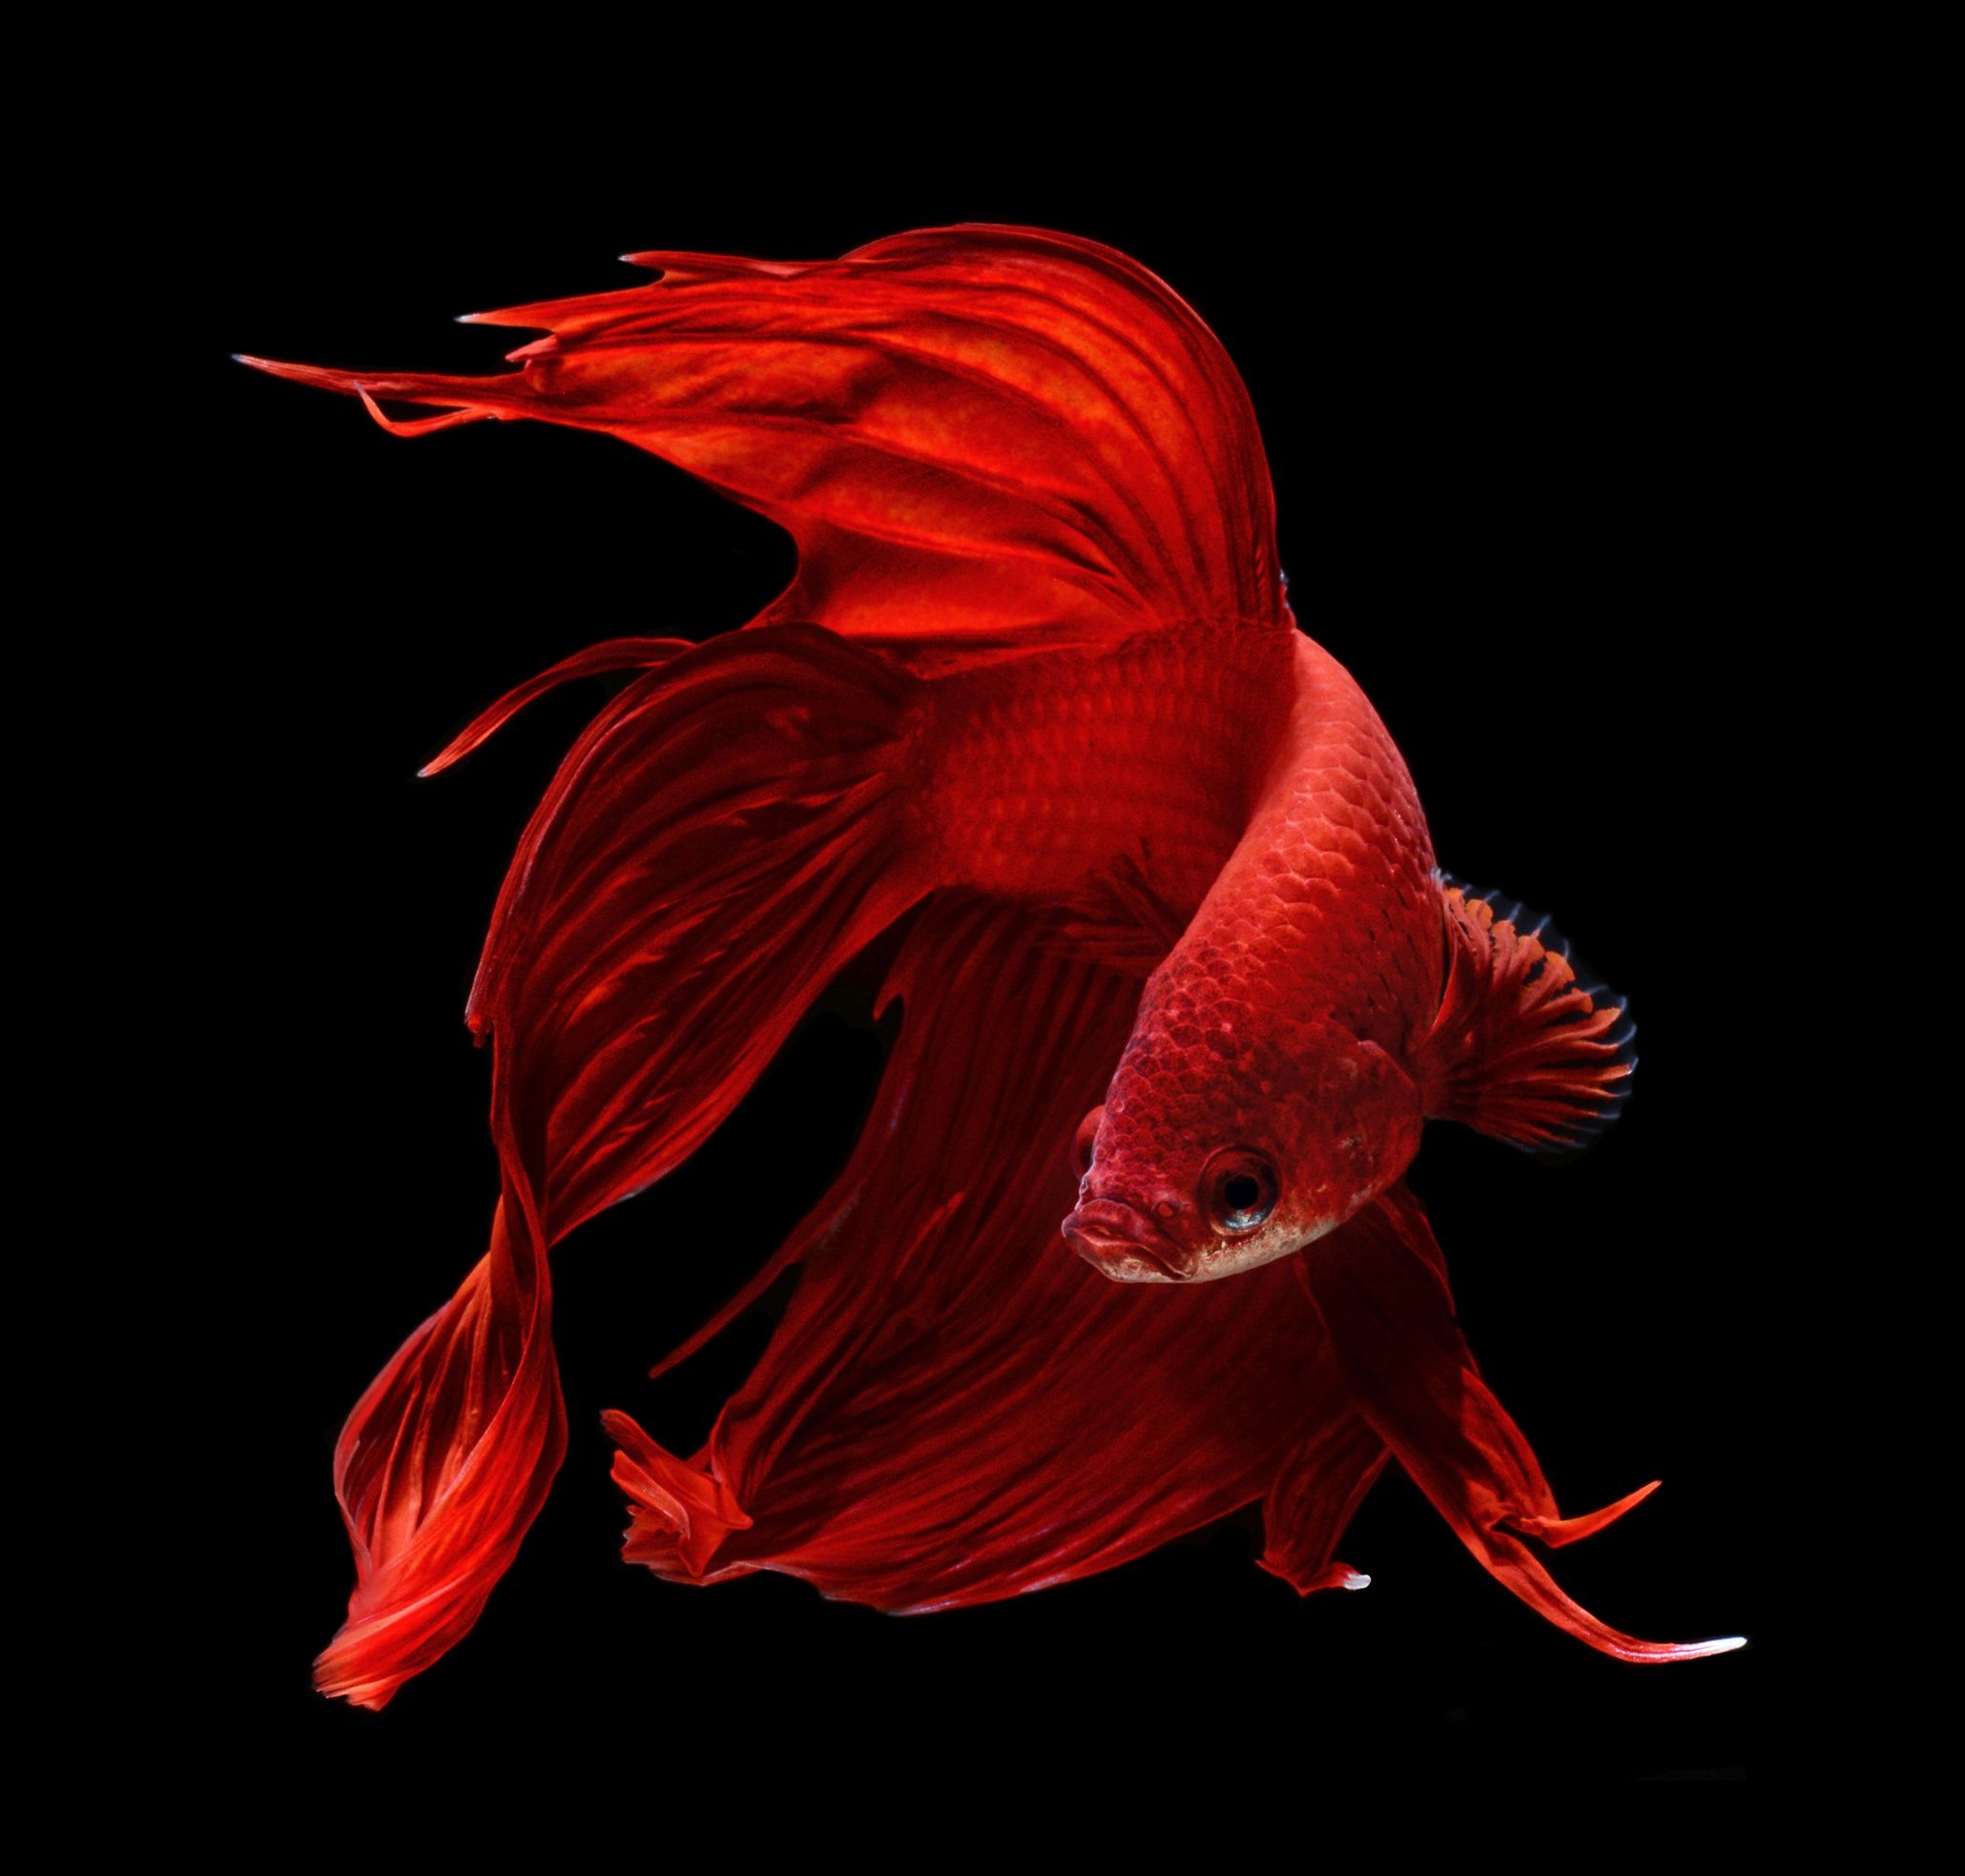 Siamese fighting fish | рыбки | Pinterest | Siamese fighting fish ...